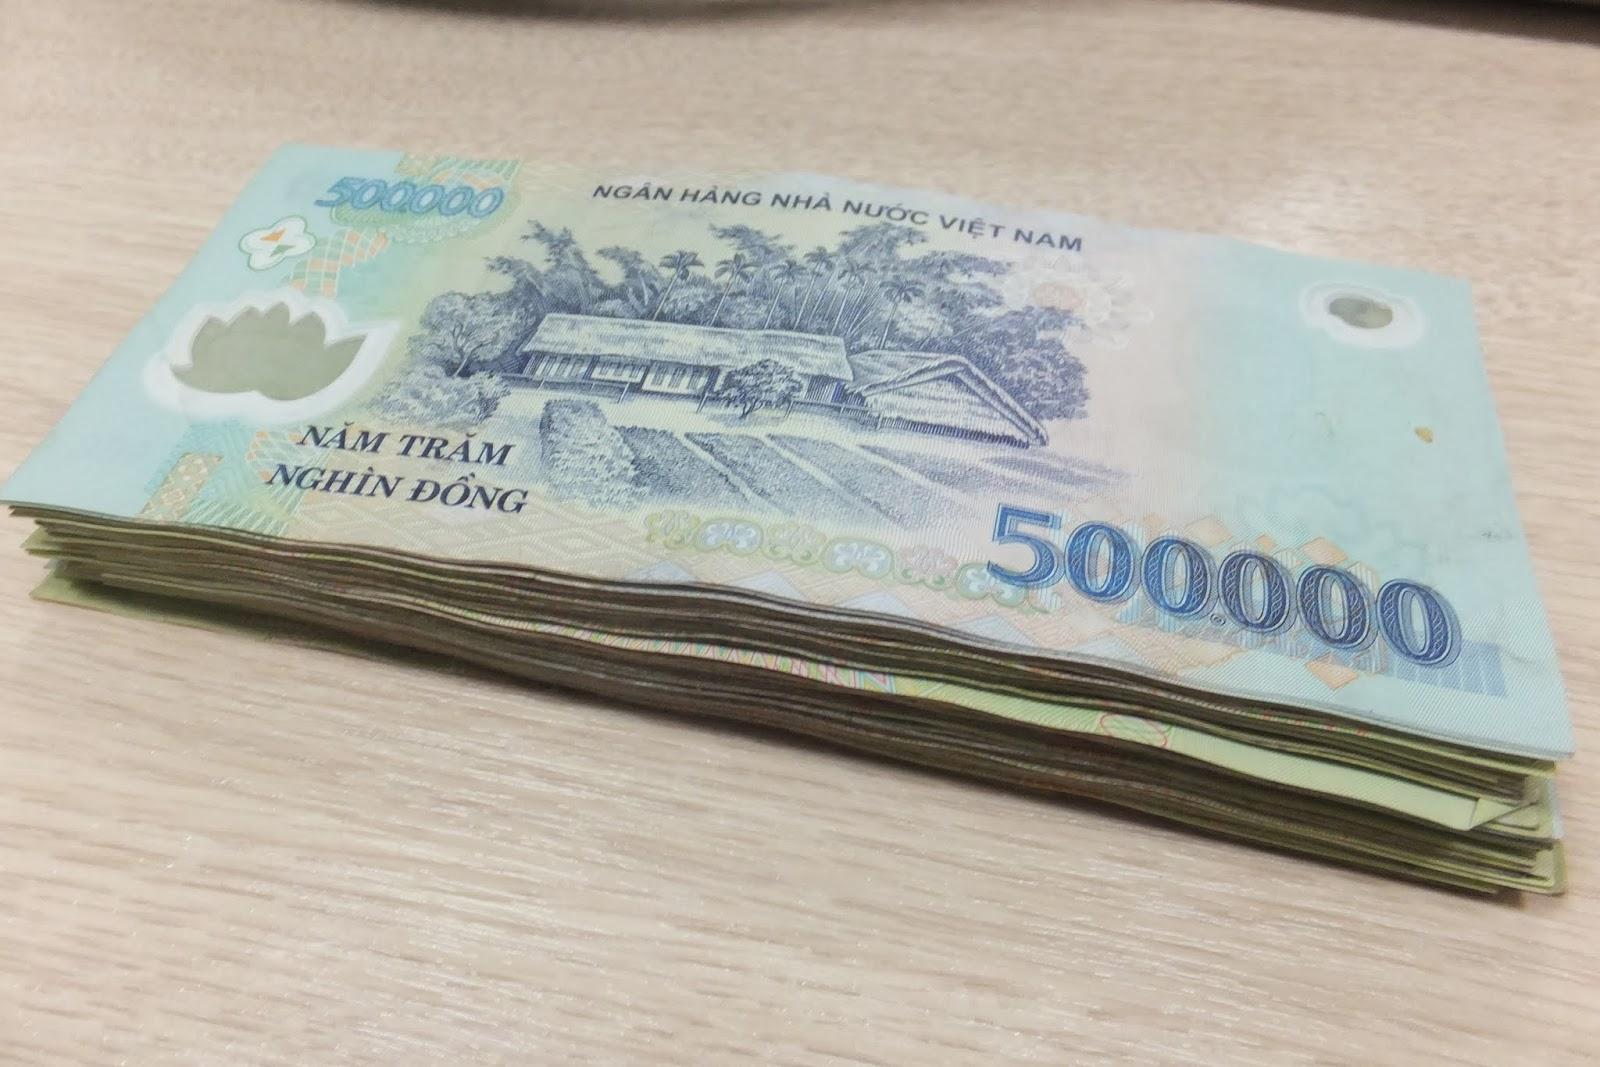 vietnamdong-500000